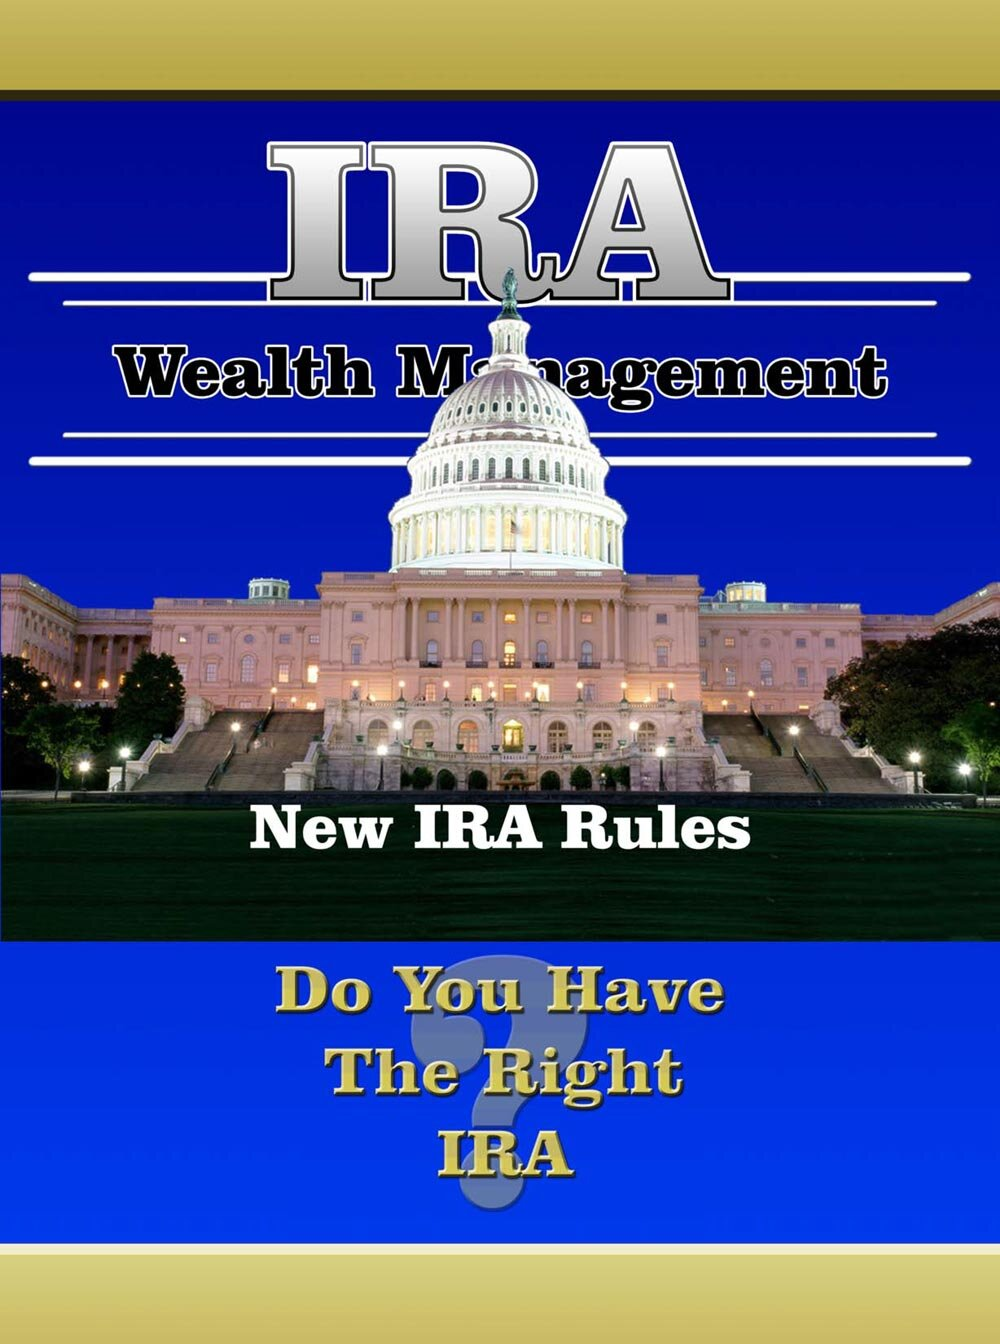 IRA-Wealth-Management-1.jpg